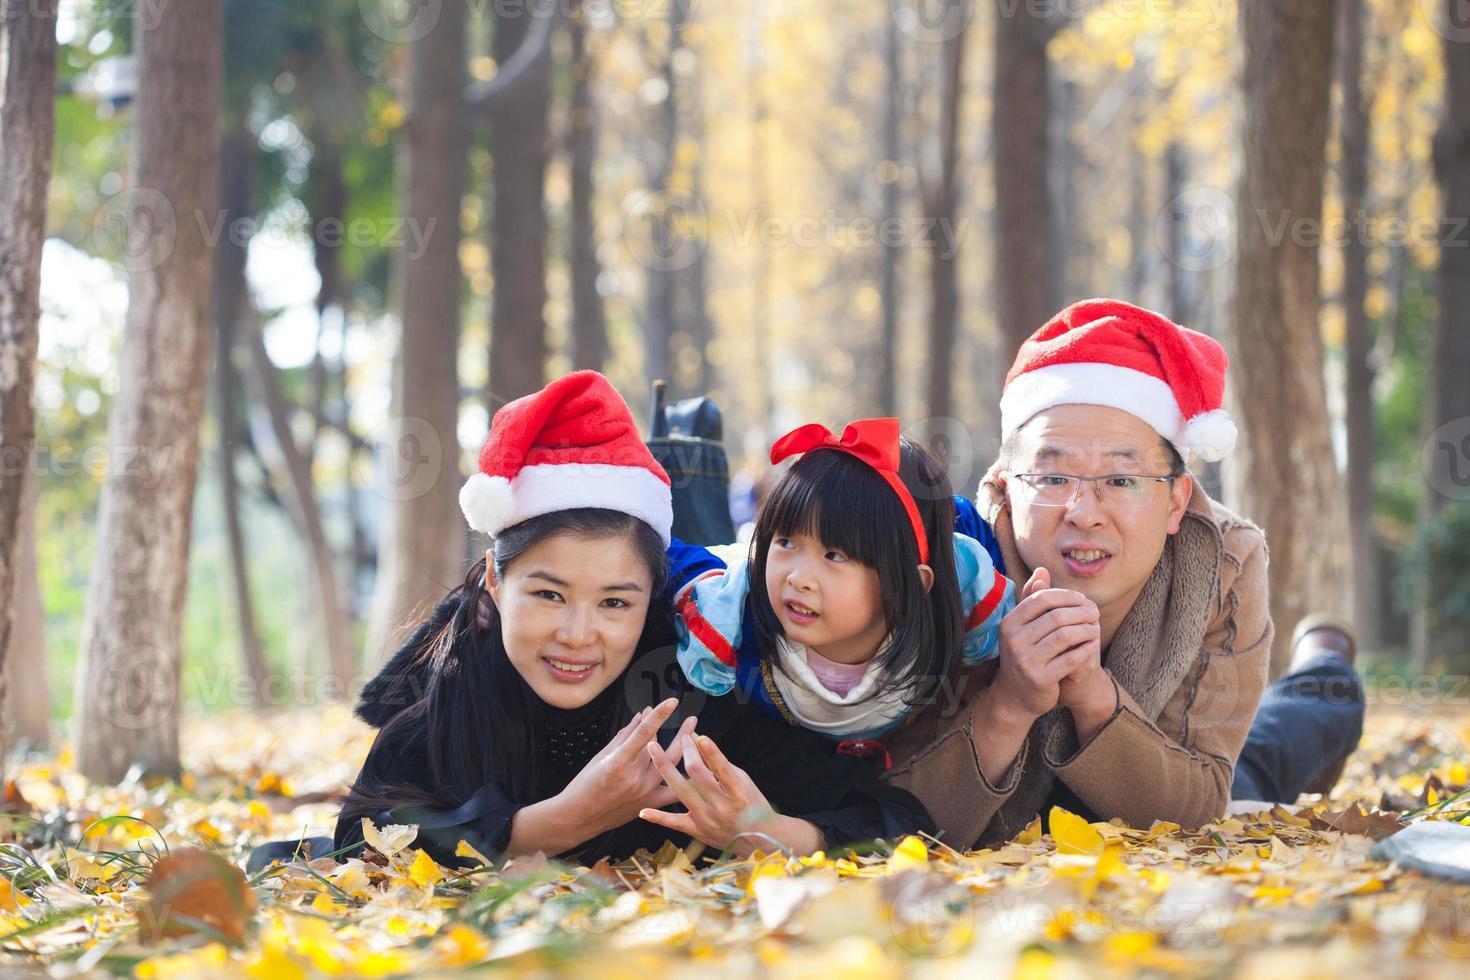 gelukkige familie saamhorigheid portret in het bos foto